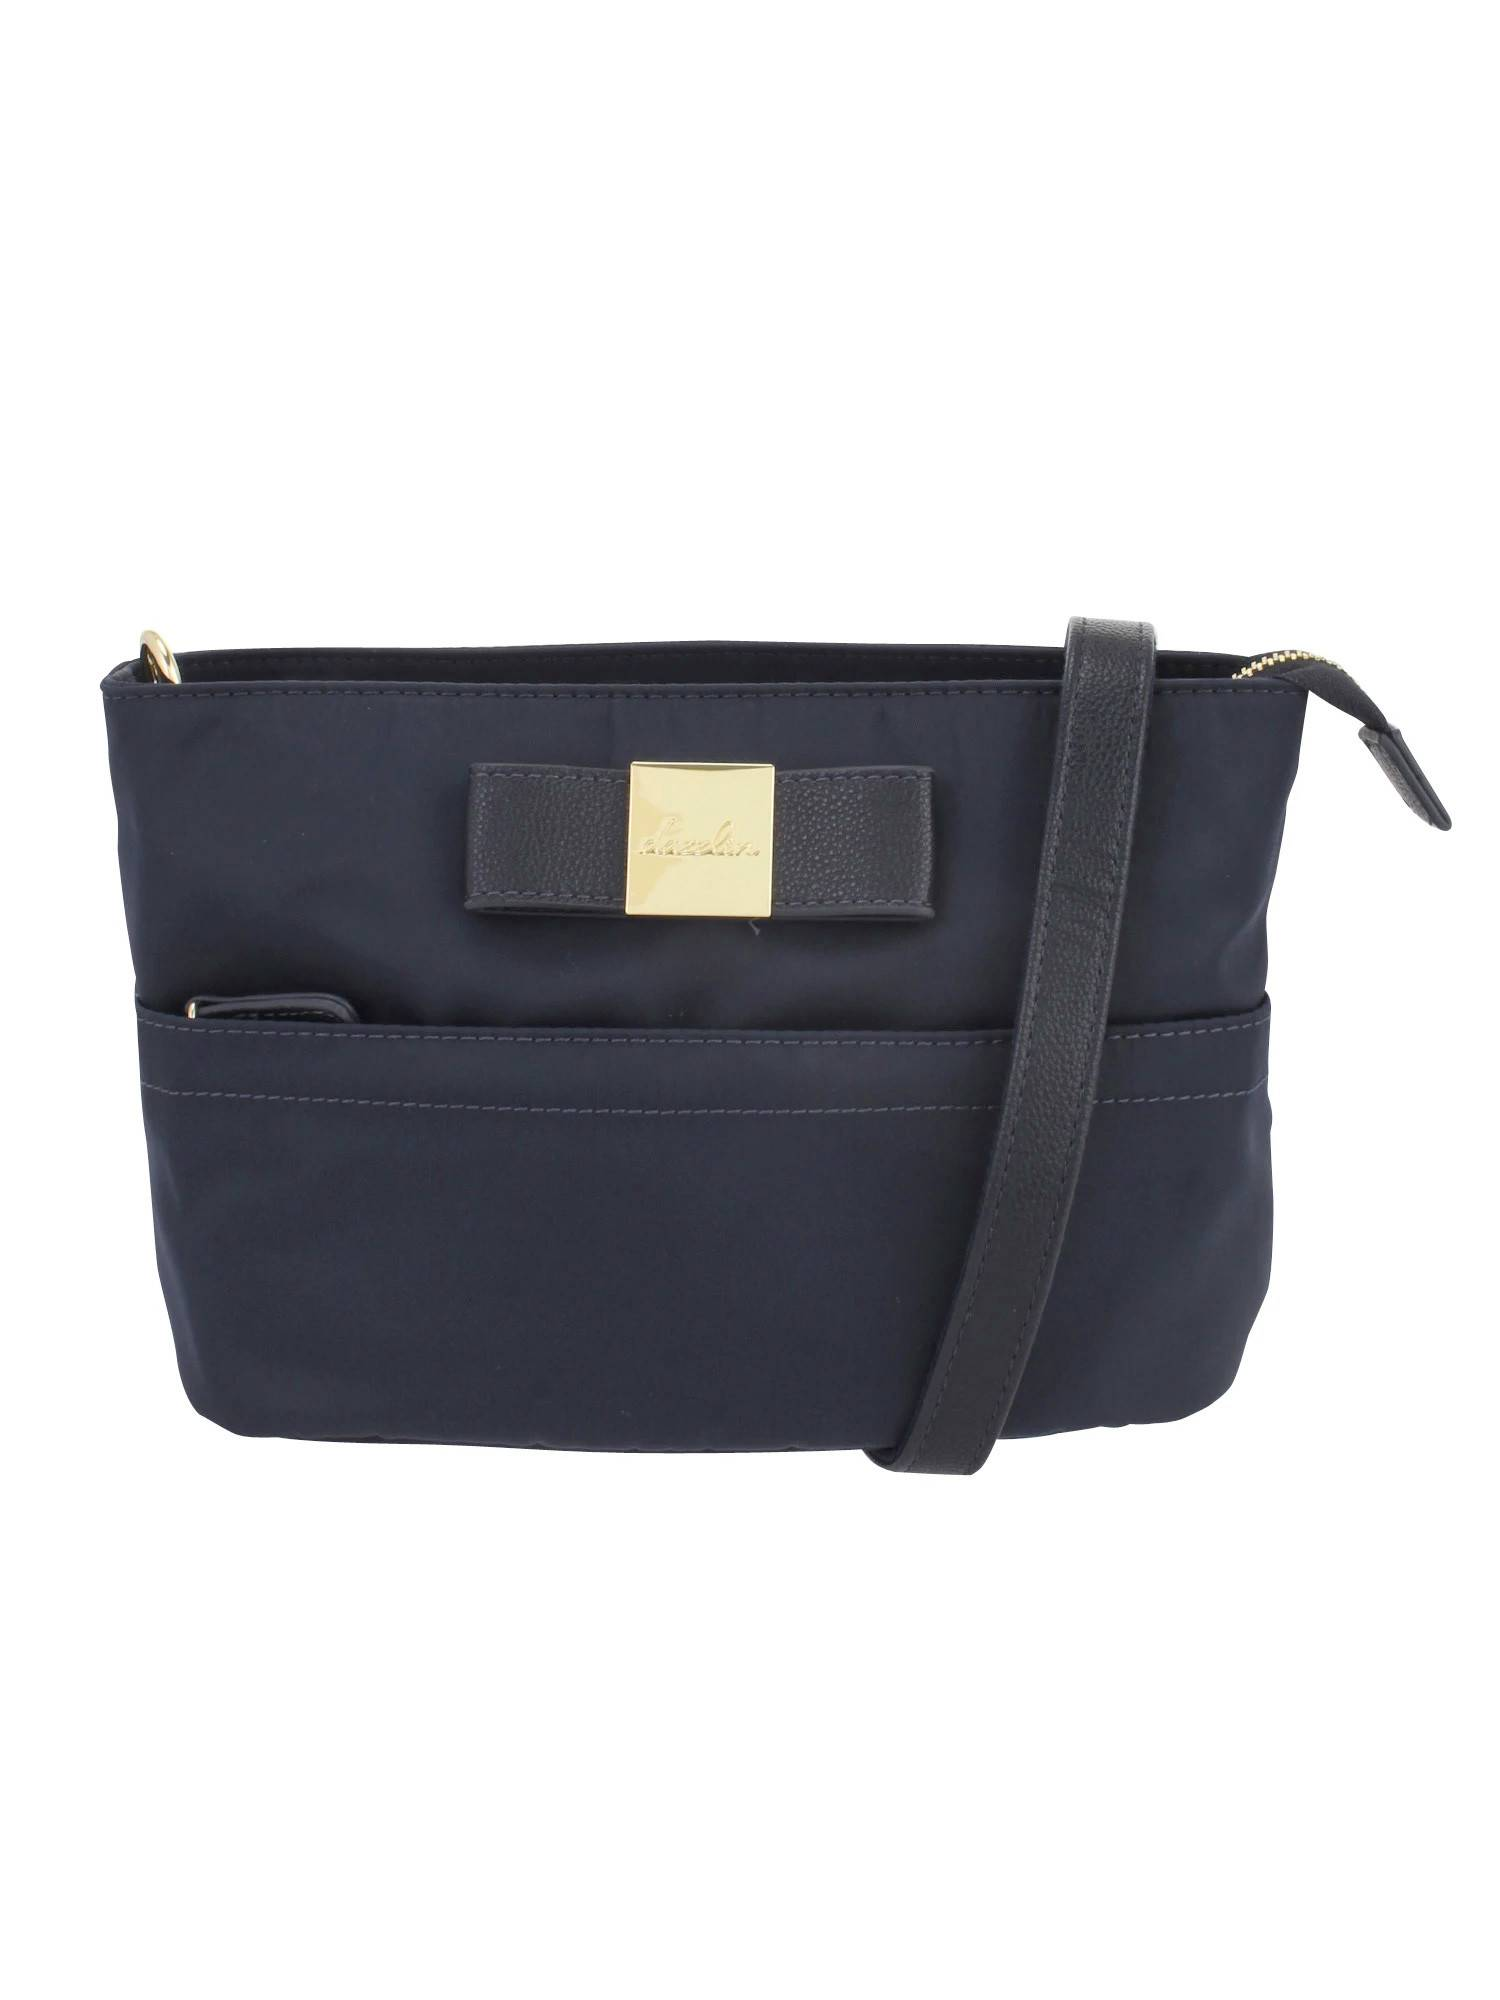 Dazzlin nylon pochette shoulder bag  Shopping for japanese item 53a292e5ae5